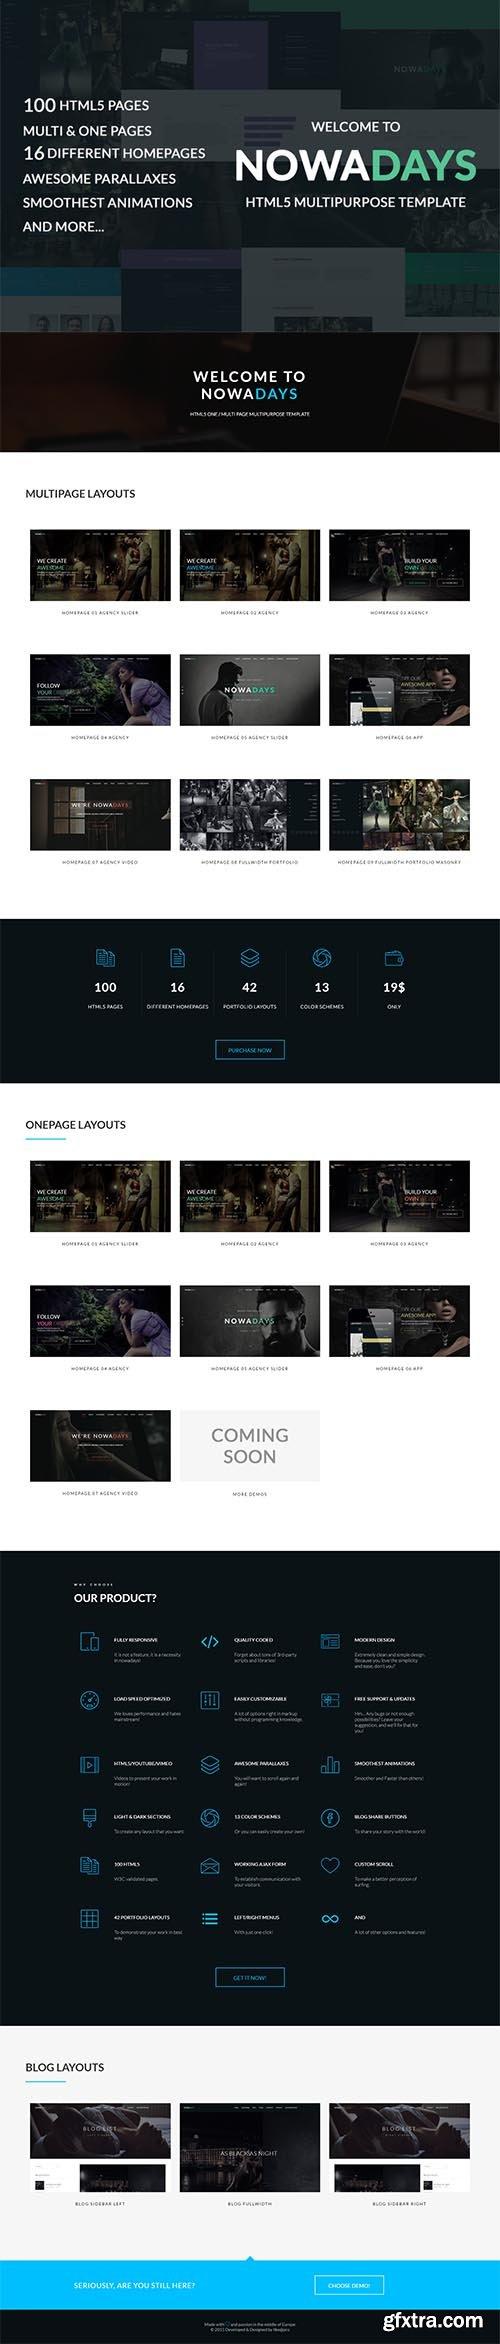 NowaDays-Multipurpose 100 HTML Theme - CM 656154